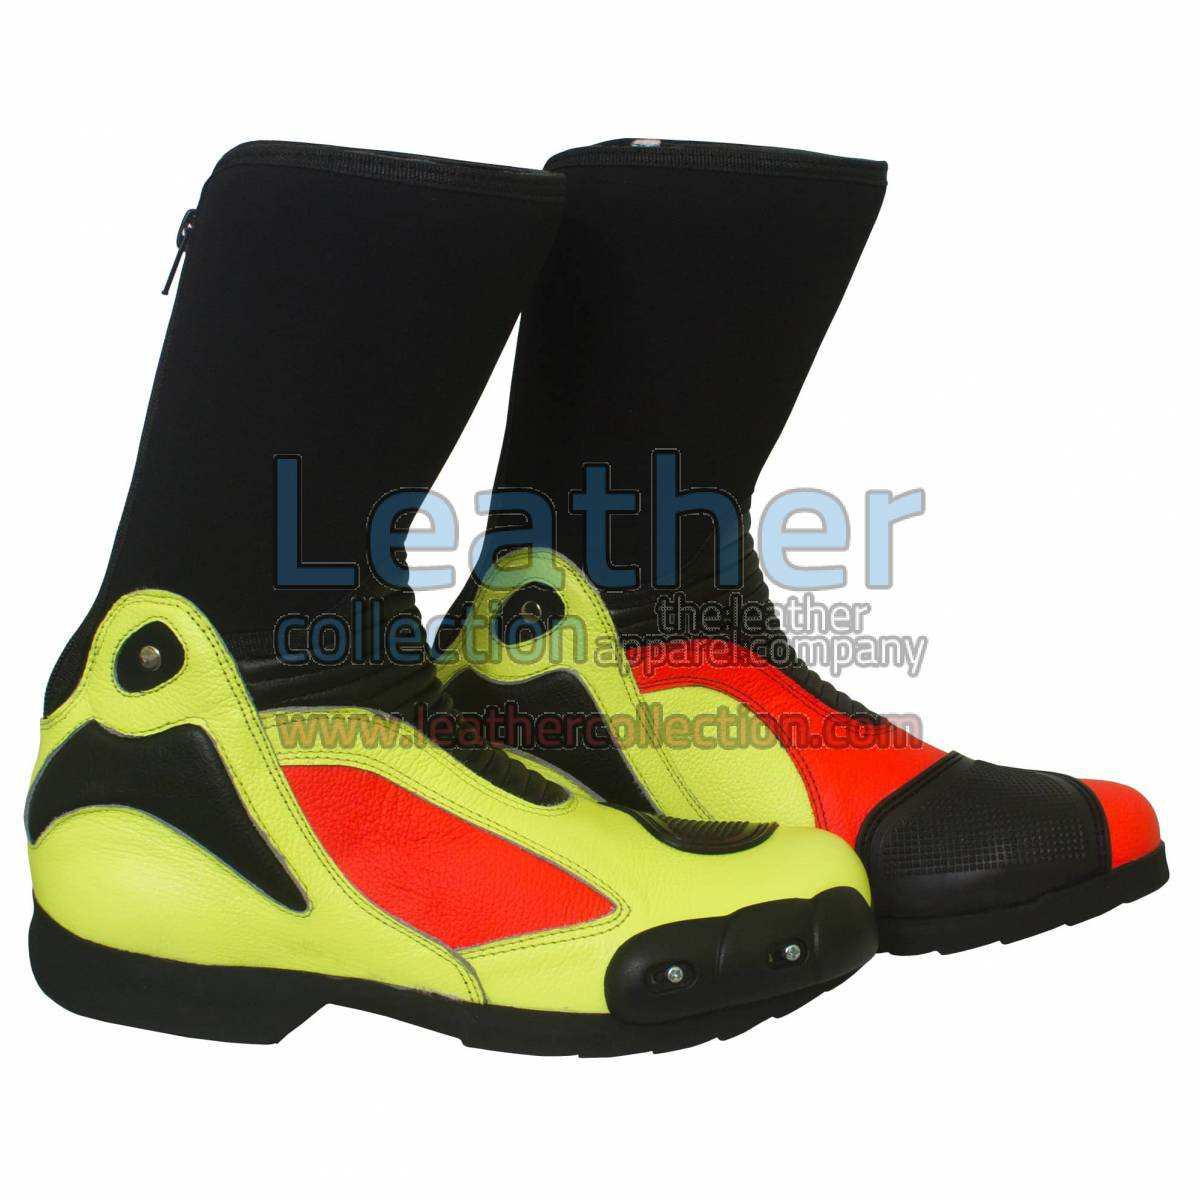 Valentino Rossi 2011 Leather Biker Boots